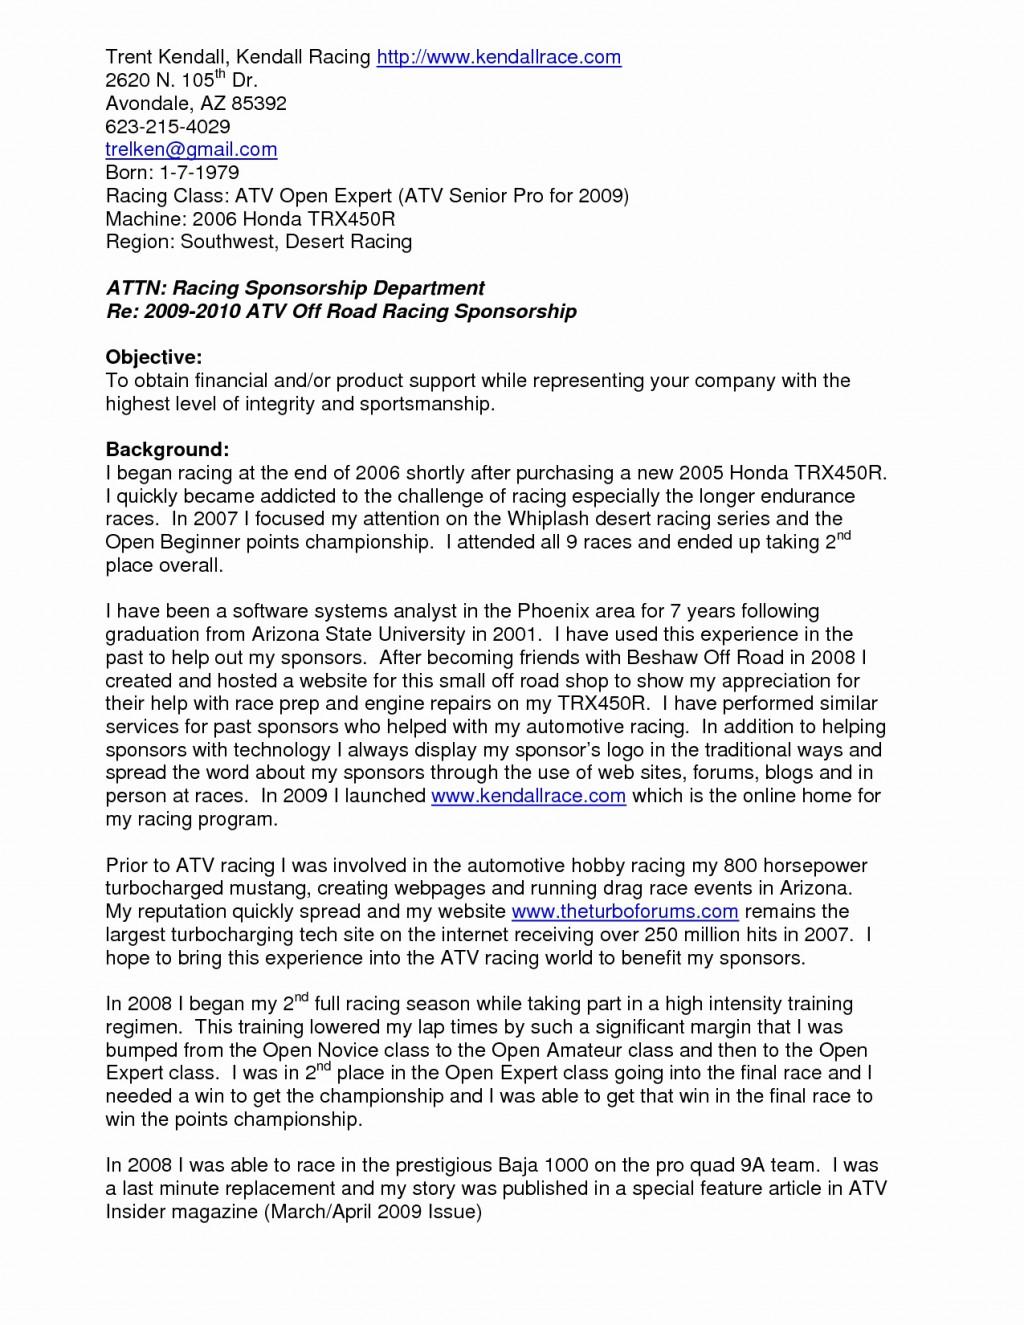 010 Background Proposal Sponsorship Best Of Essay Writing Sites Uk Top Companies Websites Large